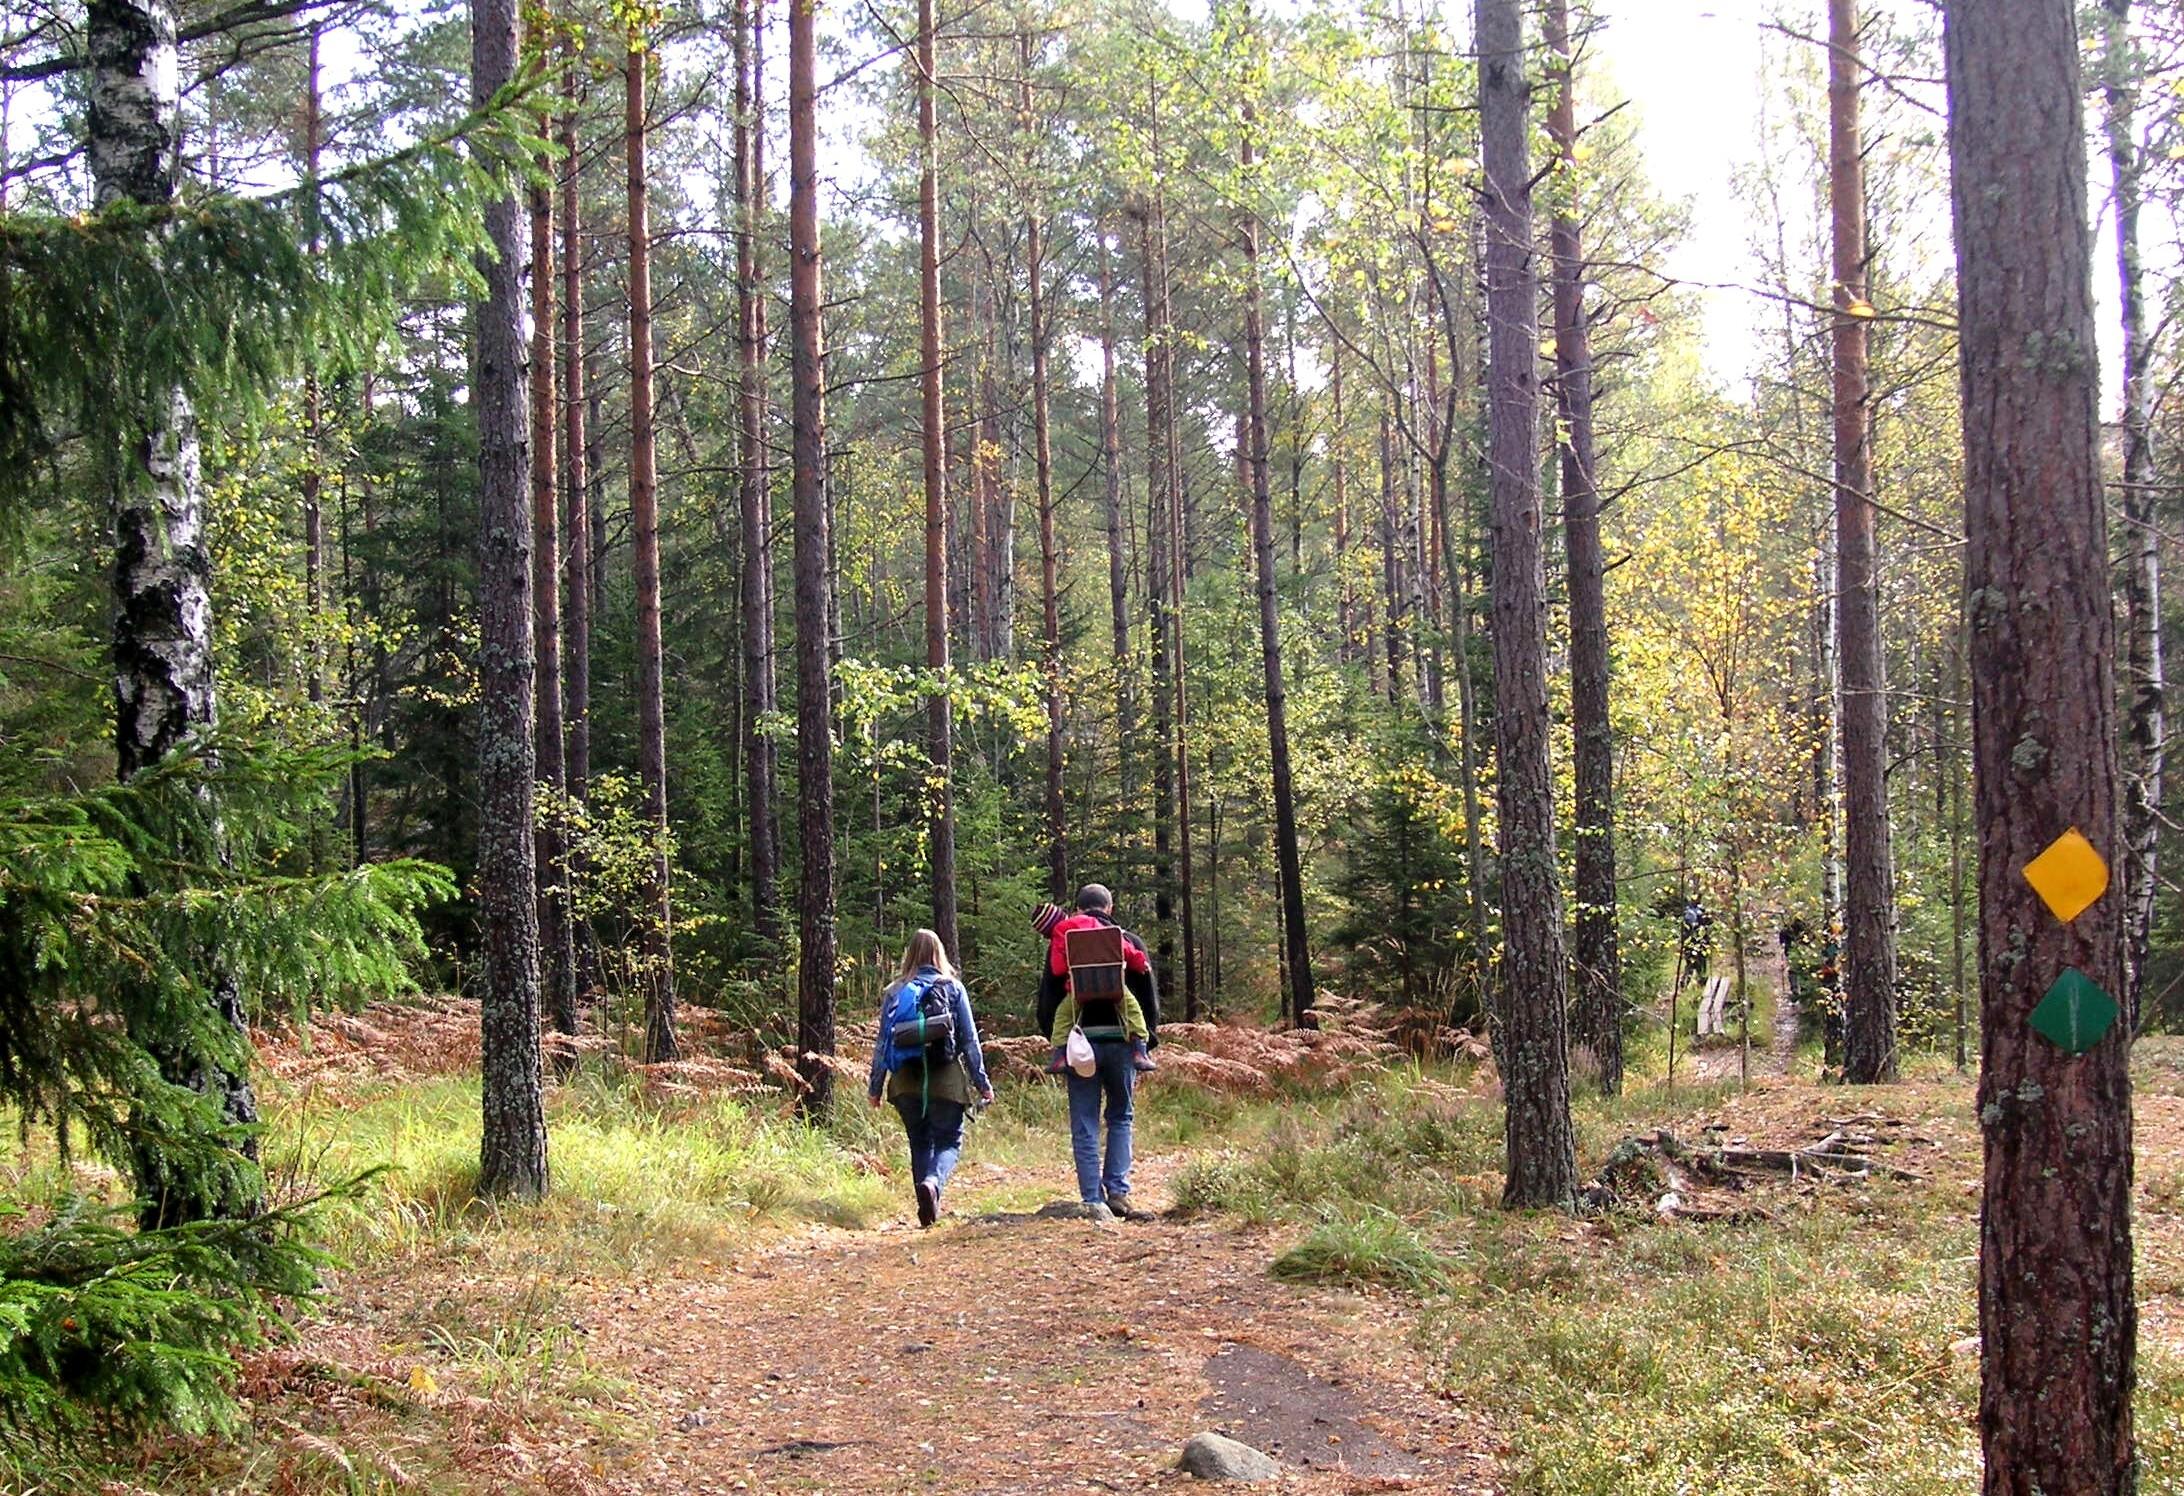 Erholung im Wald (Holger.Ellgaard)